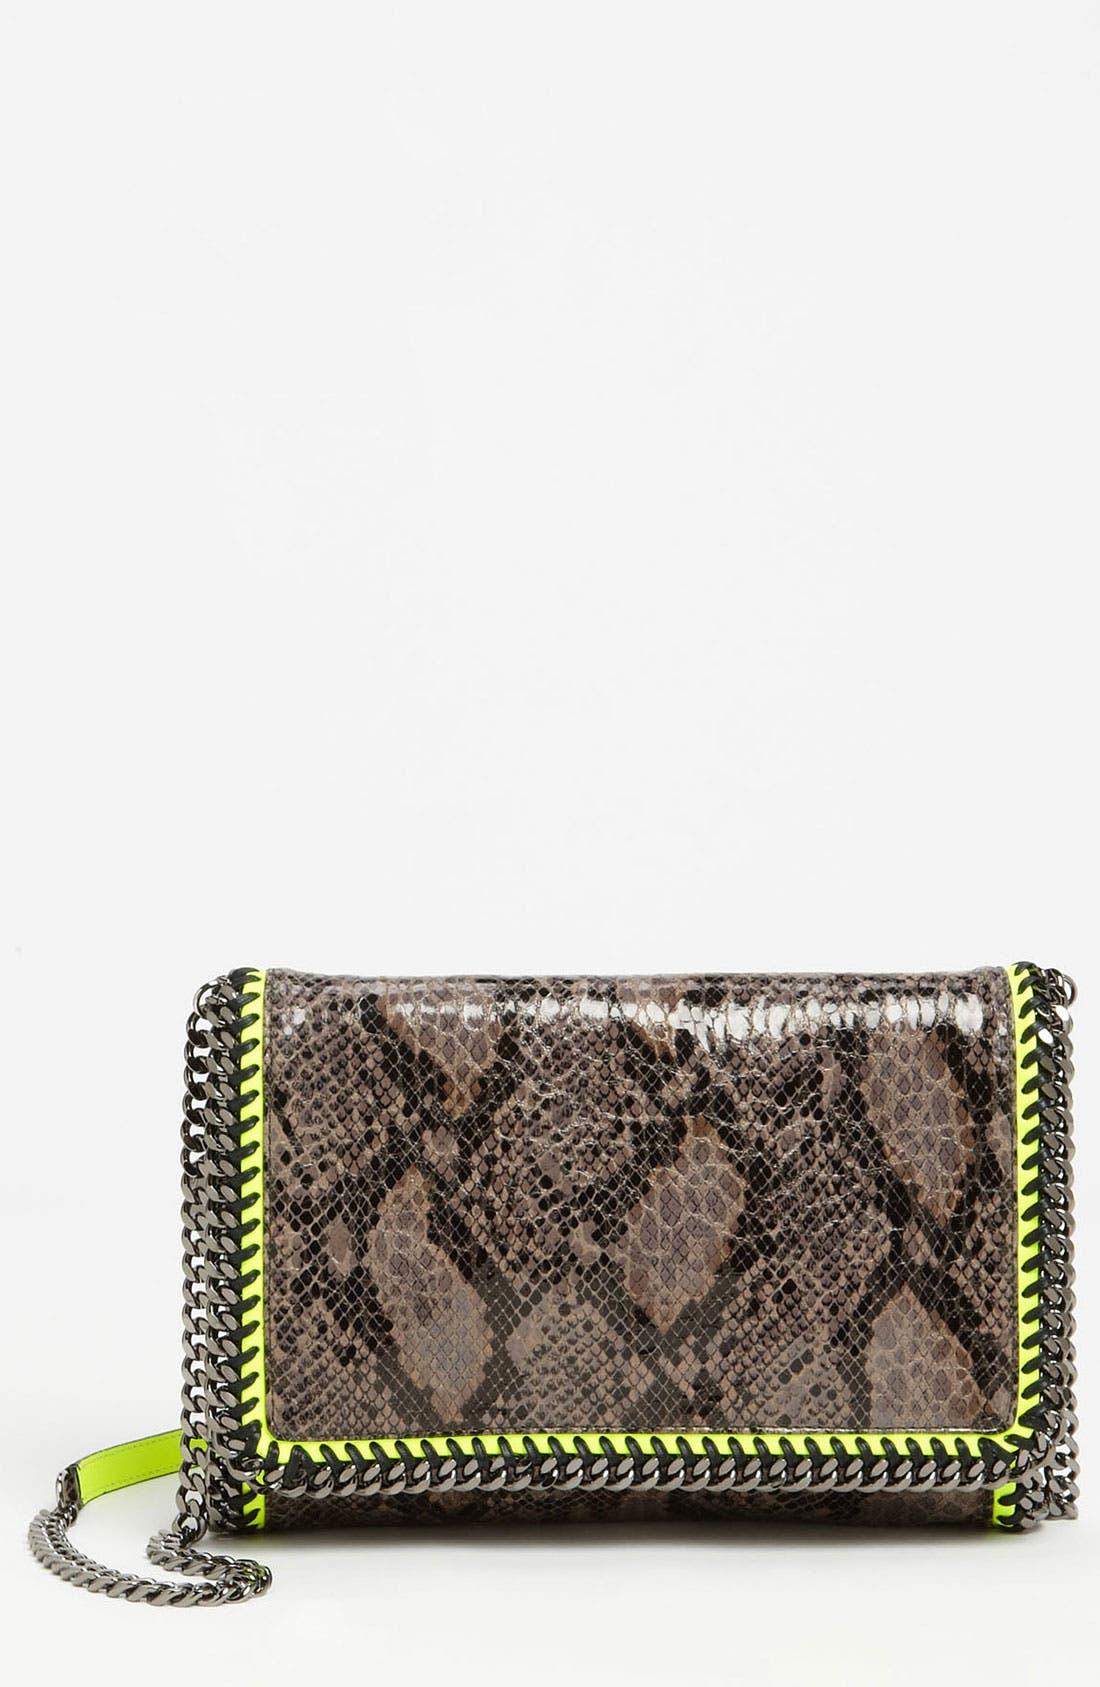 Main Image - Stella McCartney 'Falabella' Faux Python Crossbody Bag